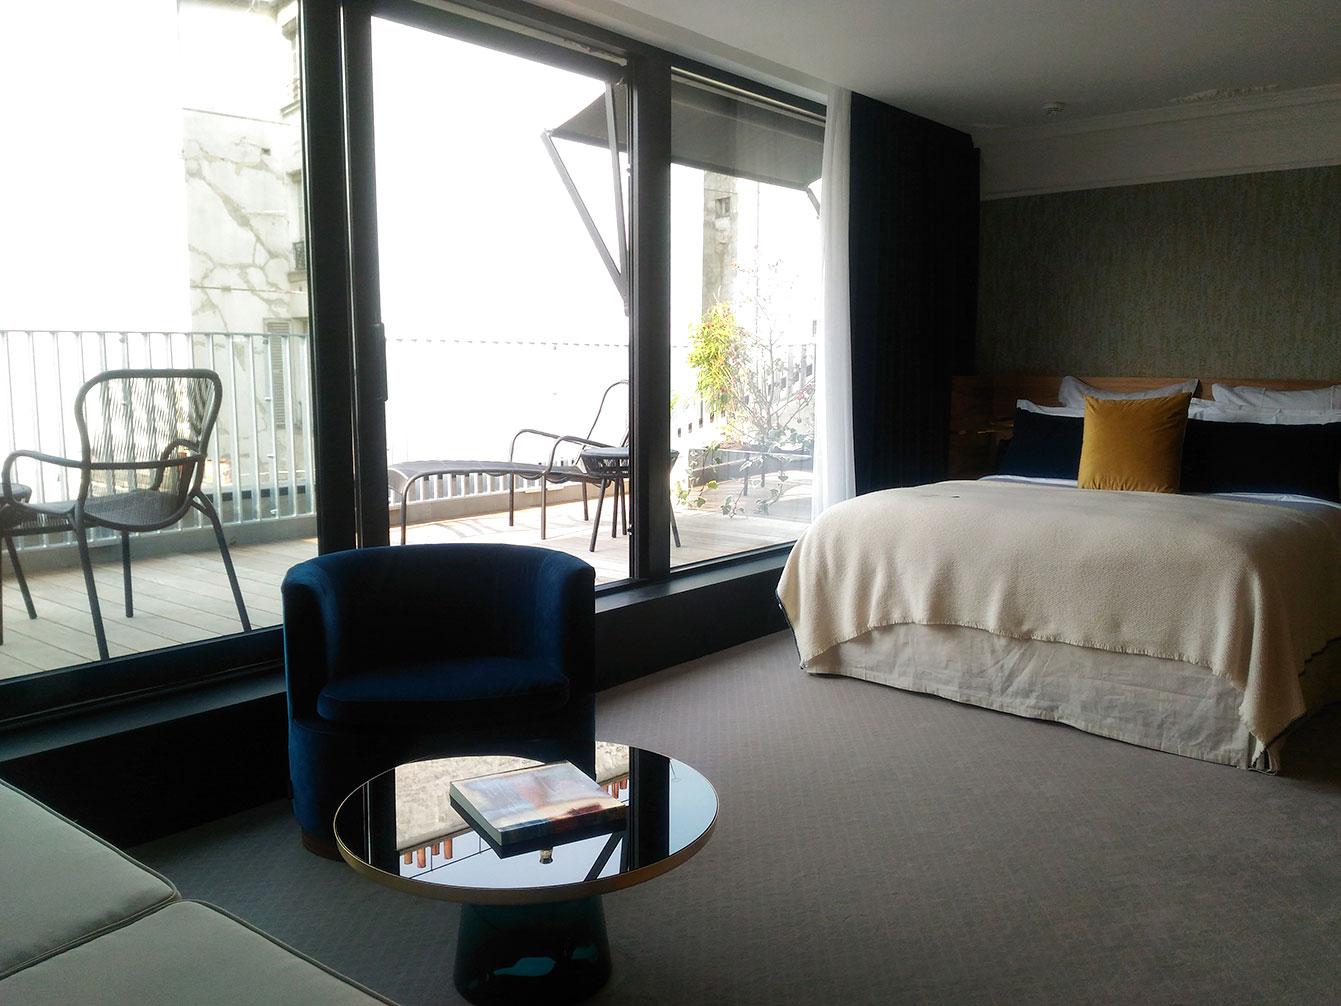 07-hotel-parister